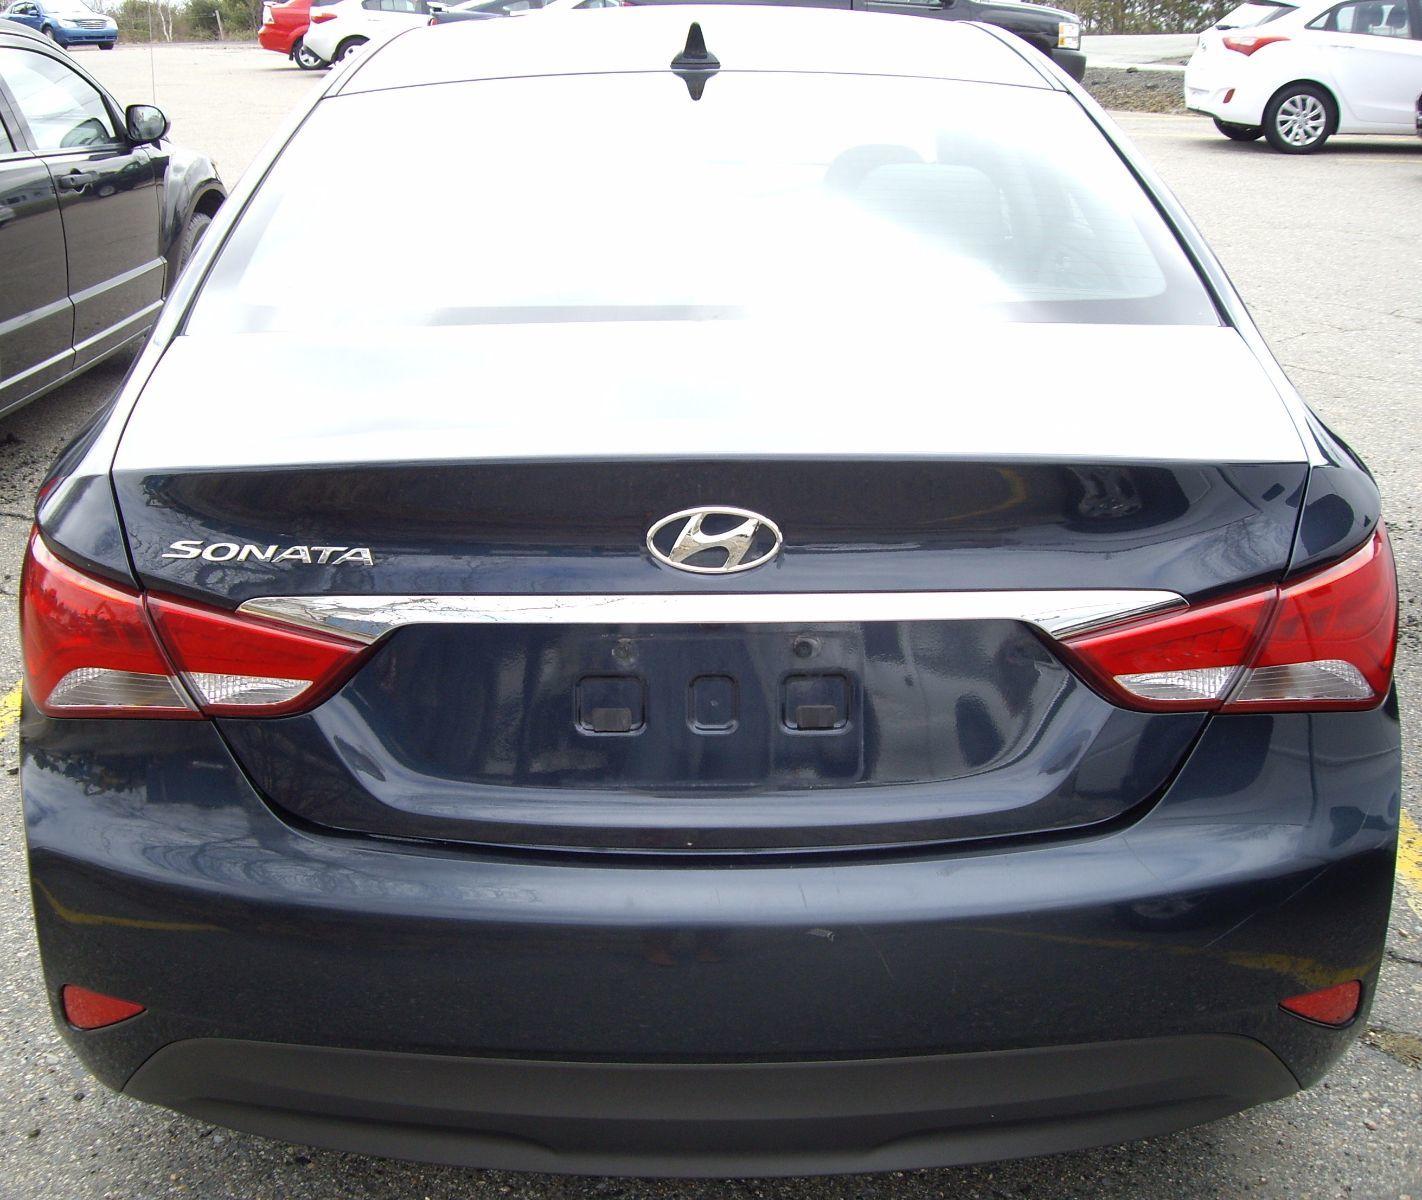 Hyundai Sonata Gls 2014: Used 2014 Hyundai Sonata In New Germany